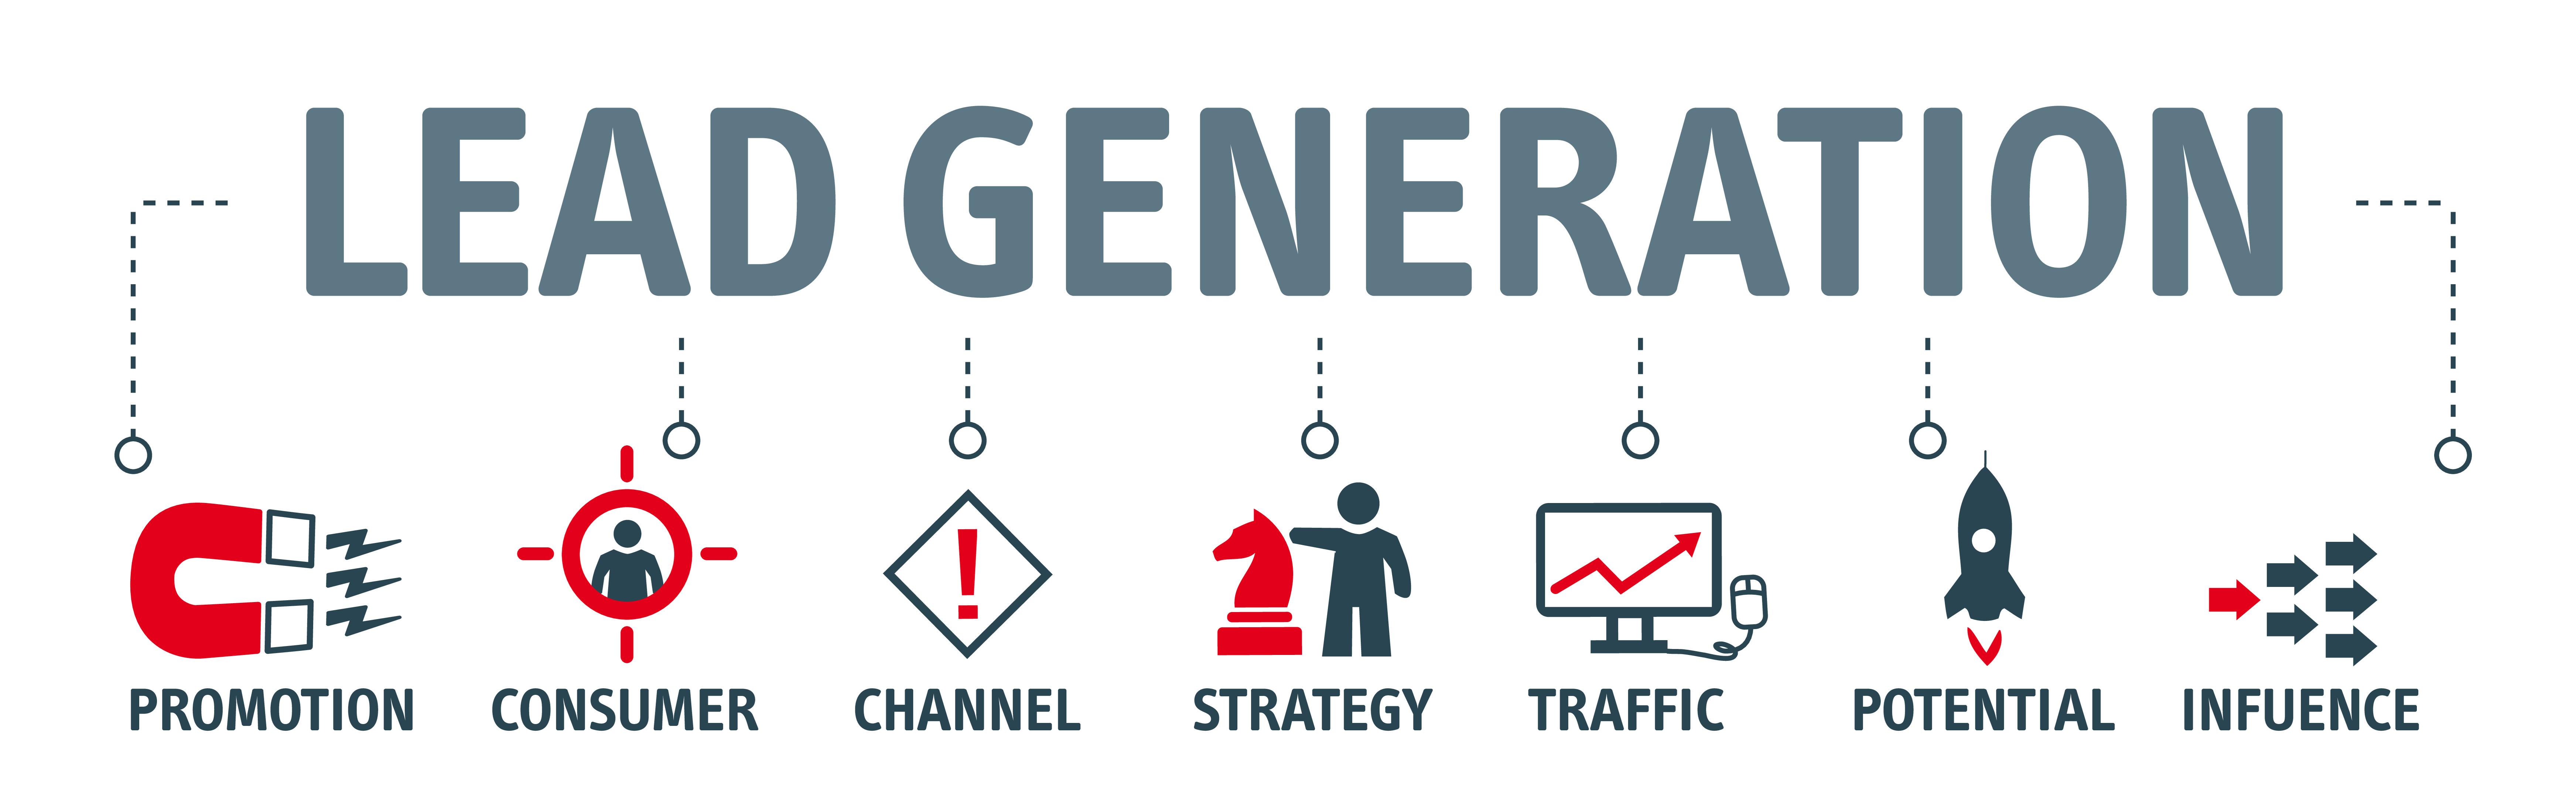 2021 Top Lead Generation Tools